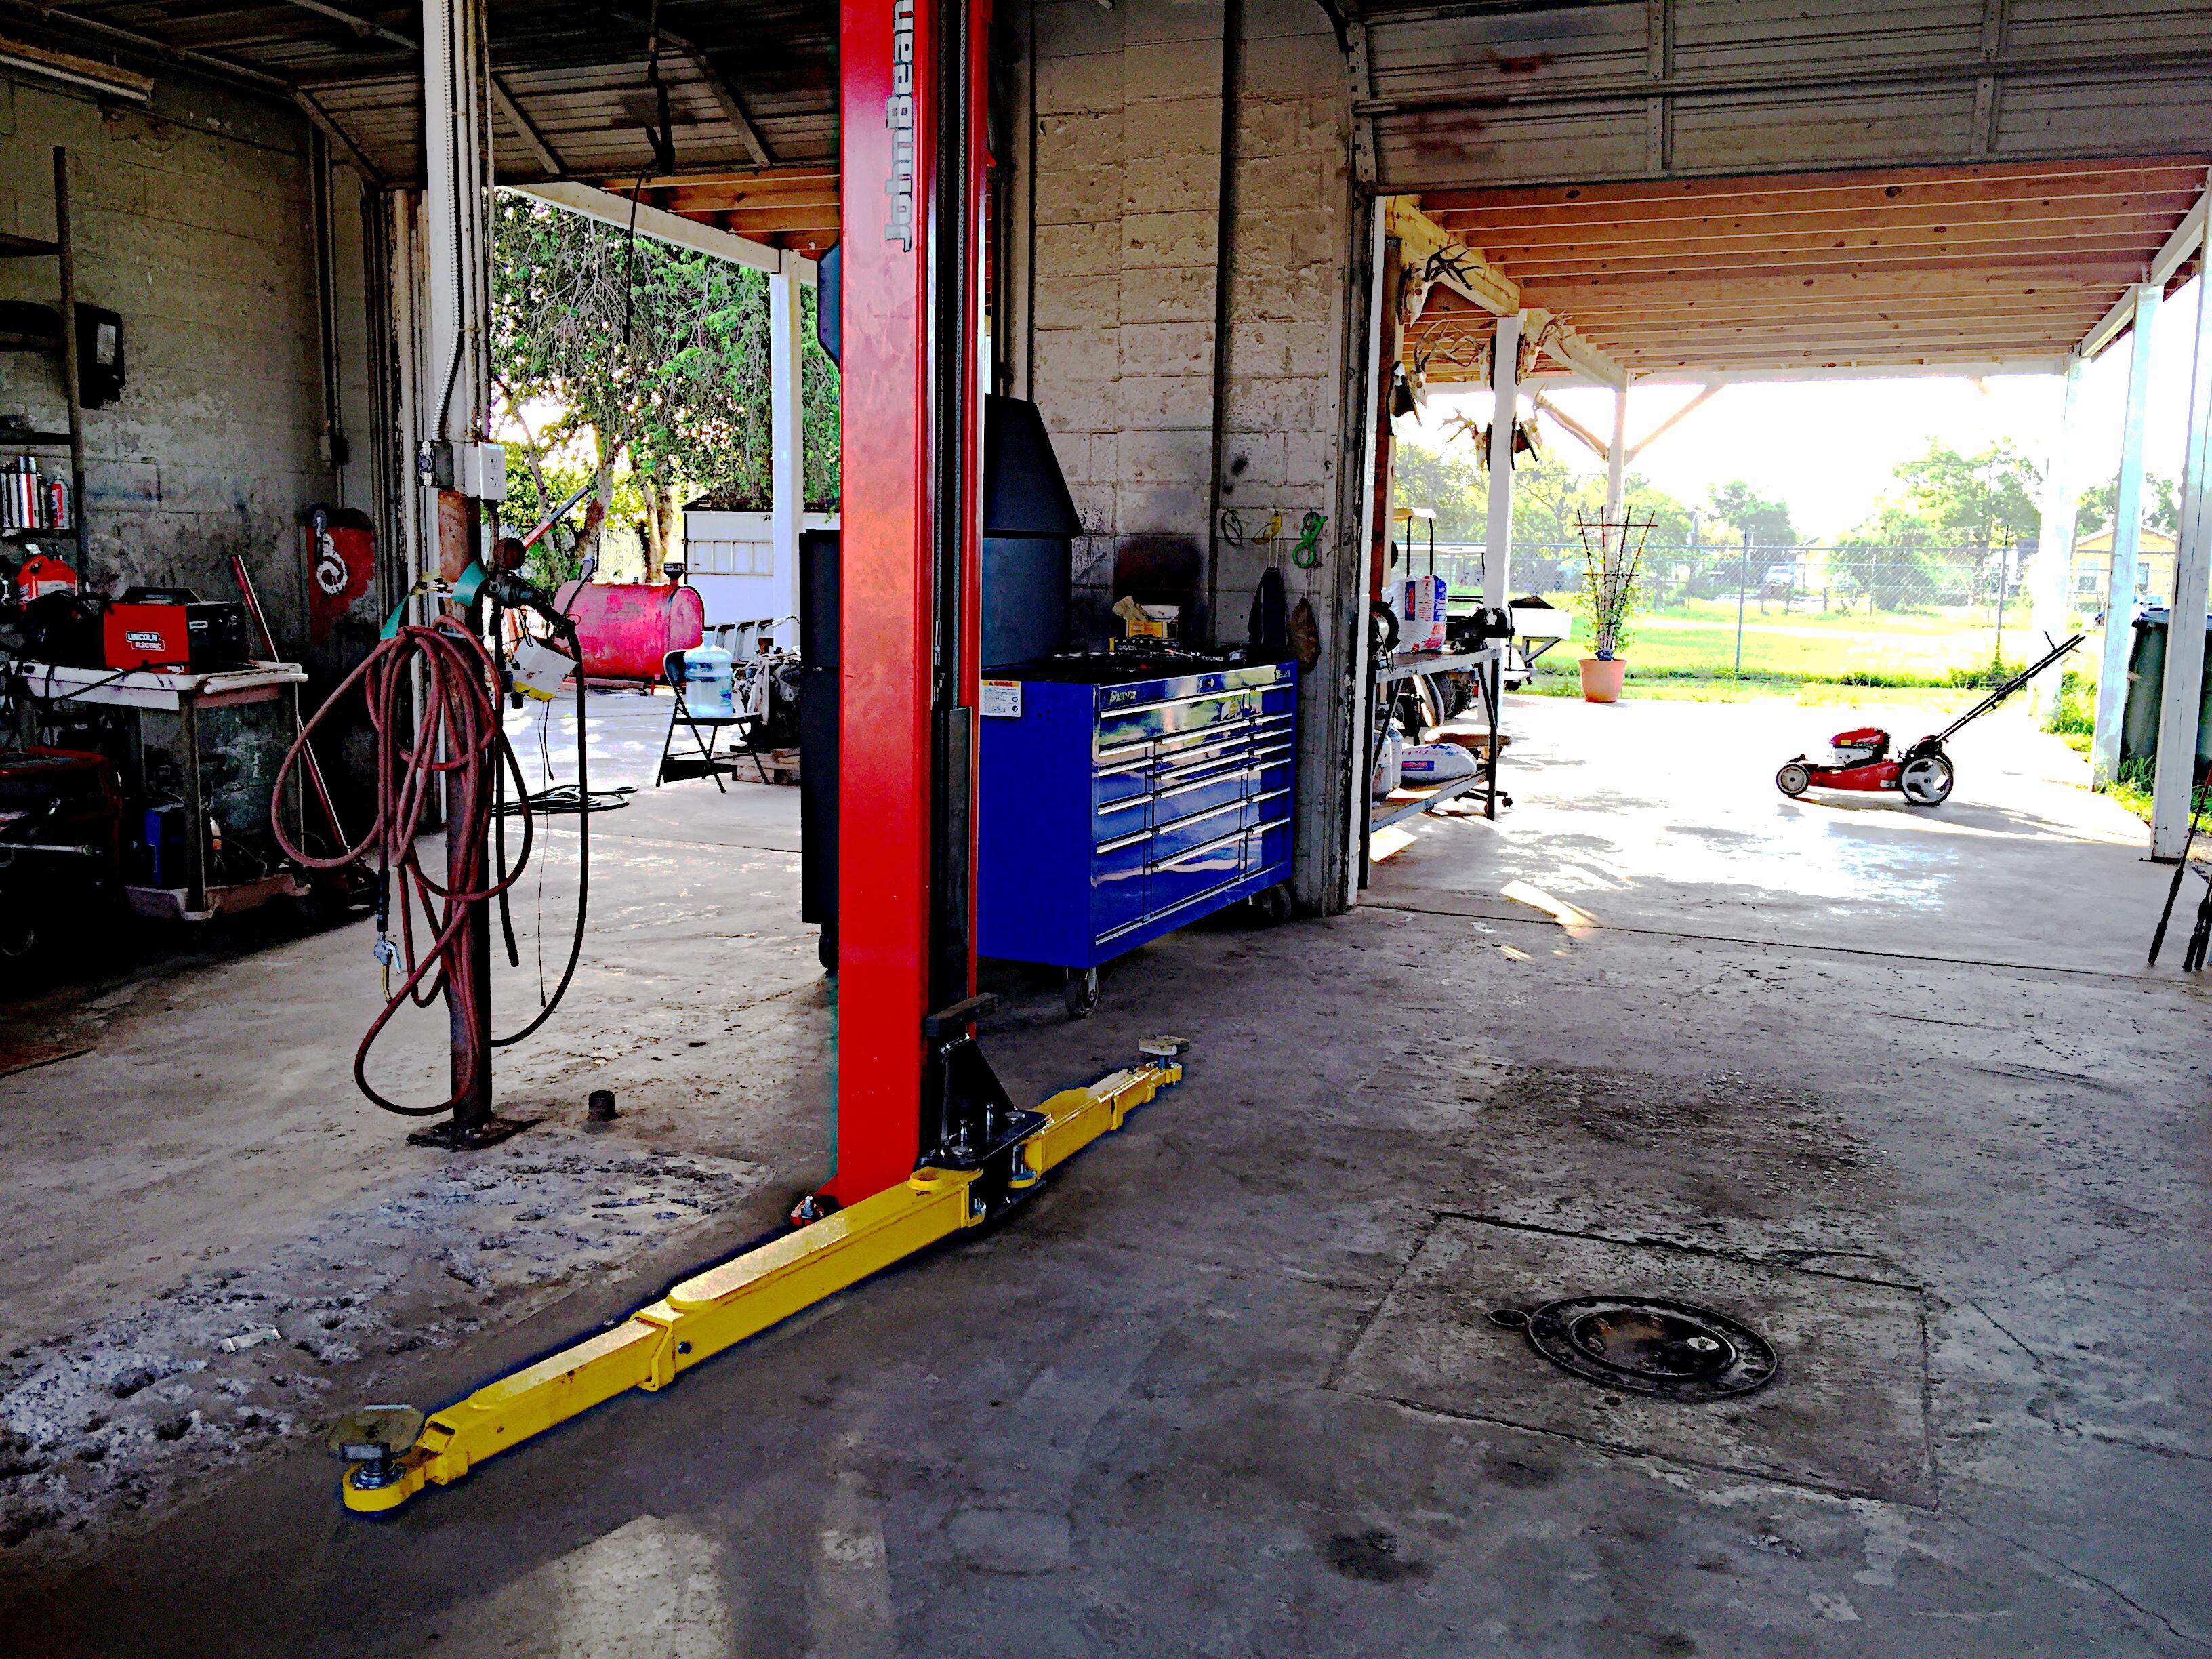 Inside Auto Repair Facility